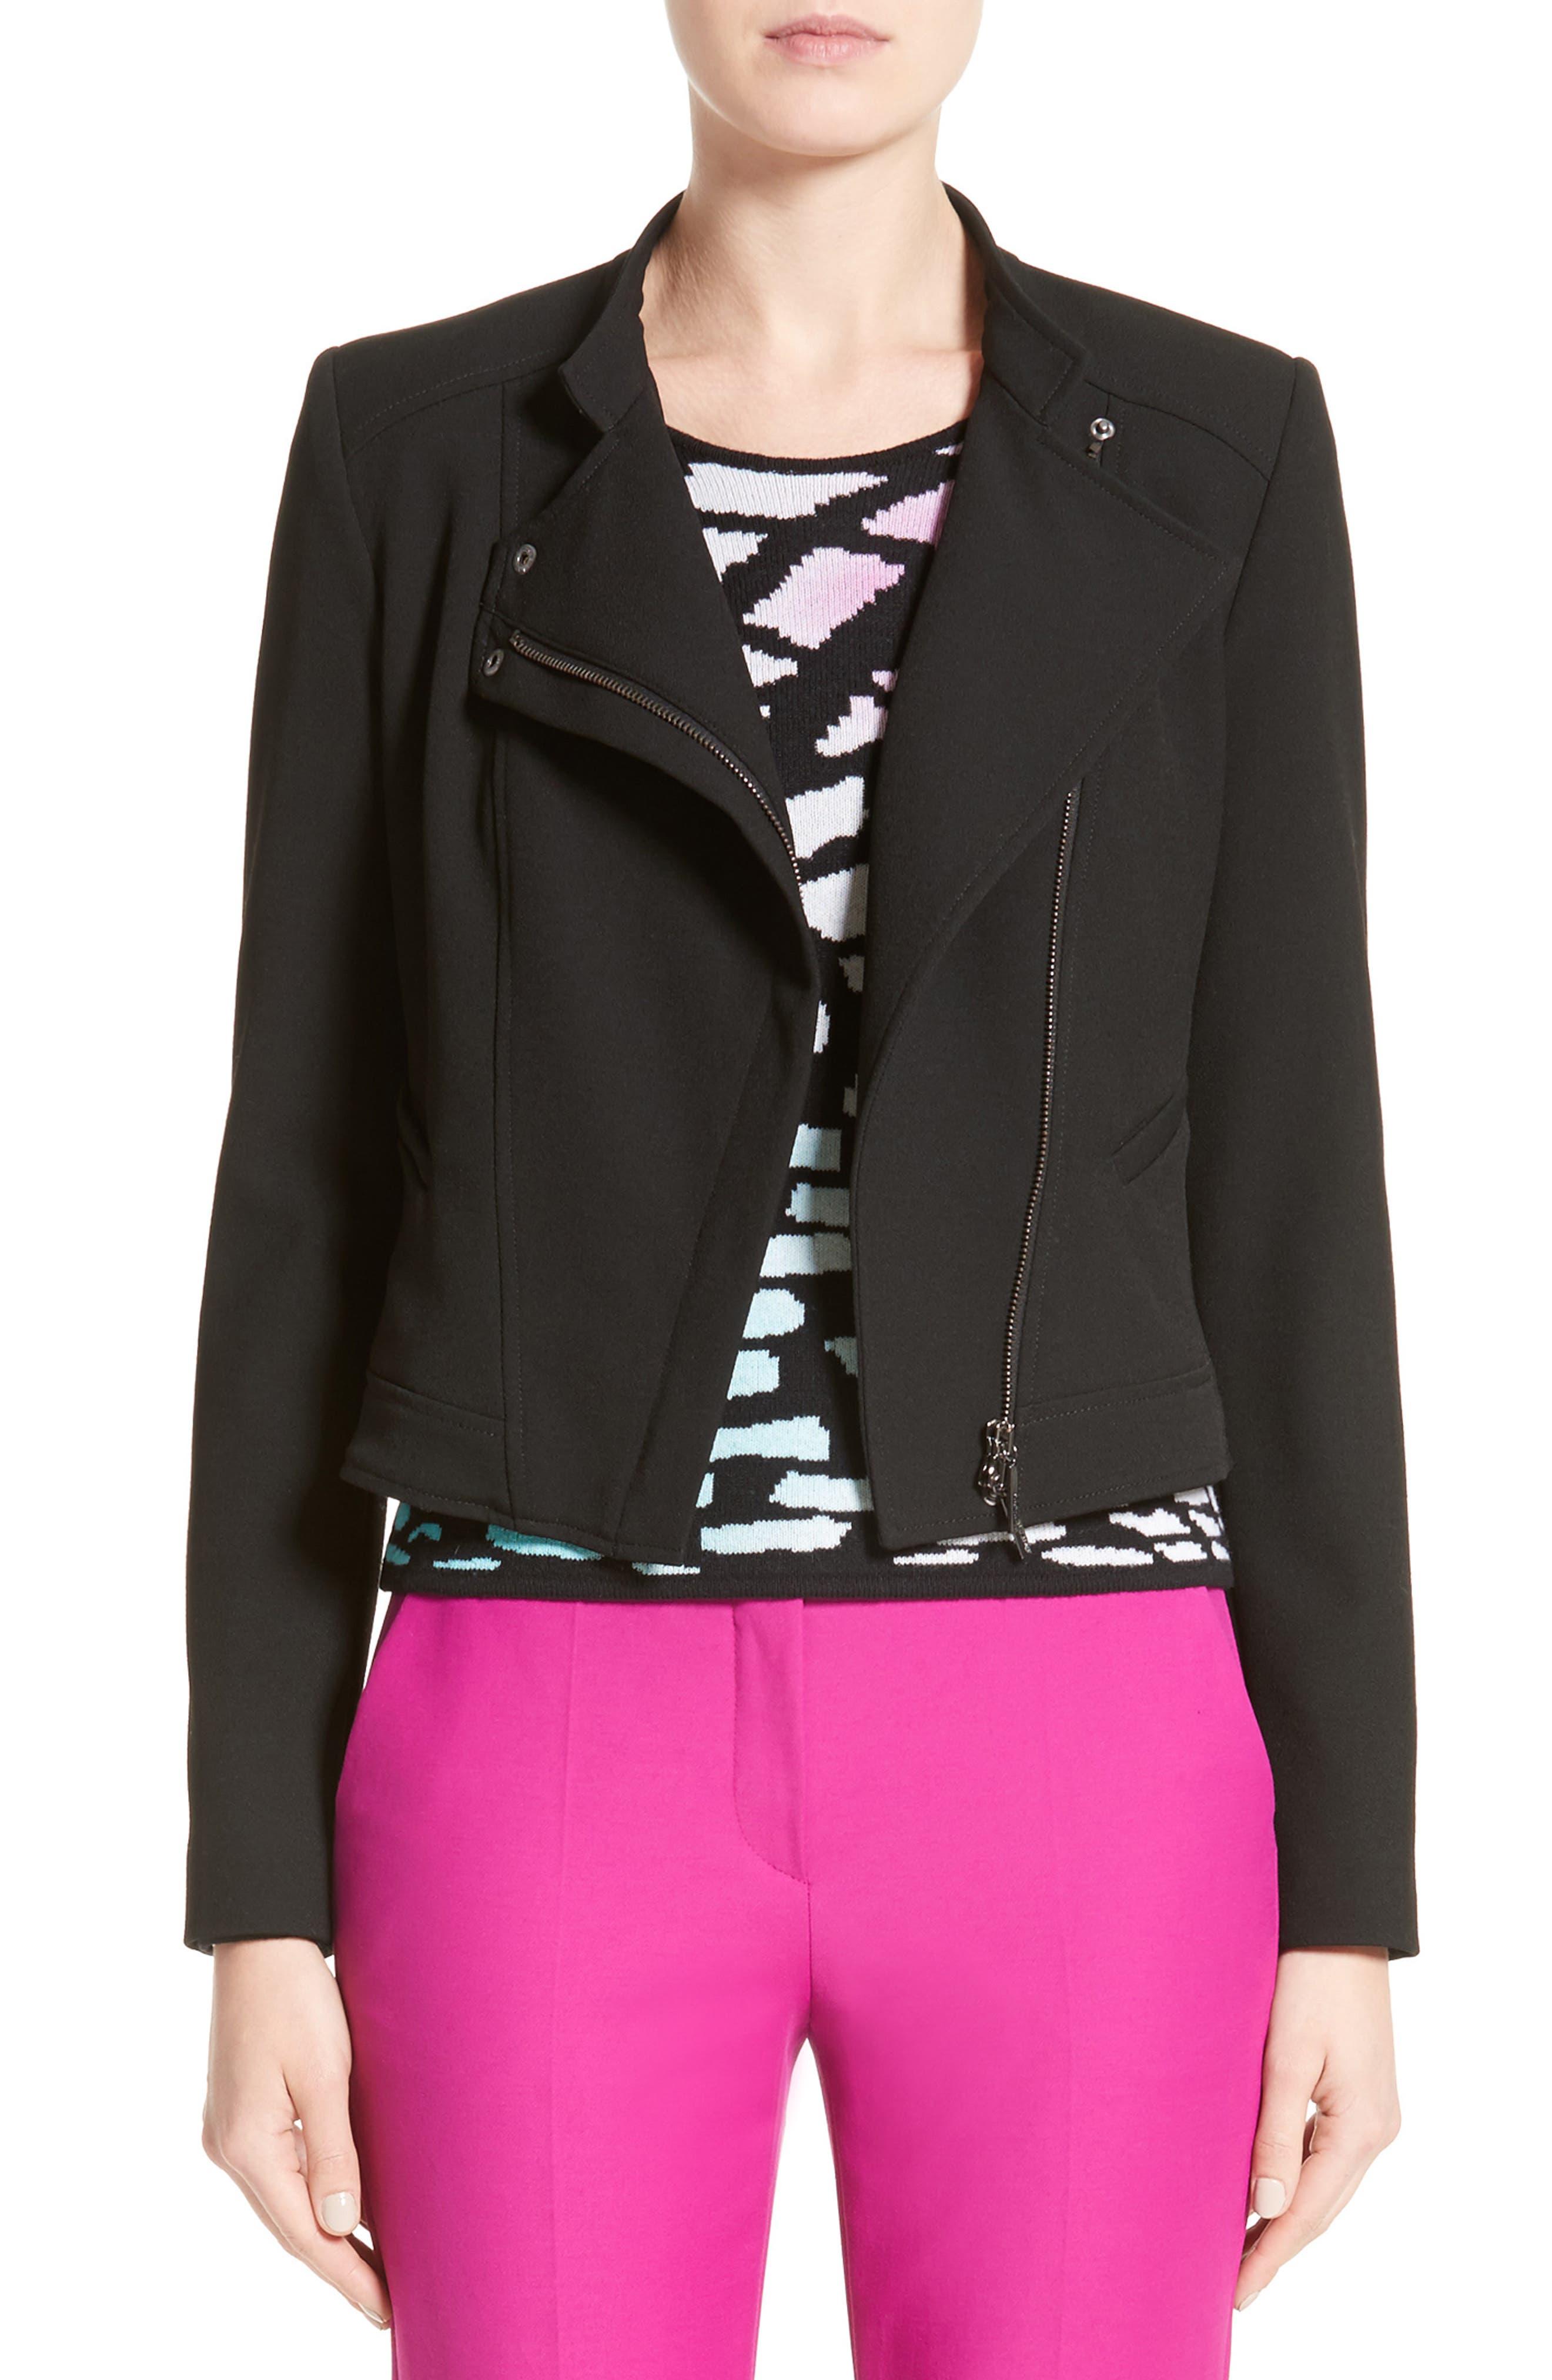 Armani Jeans Crepe Moto Jacket,                         Main,                         color, Black